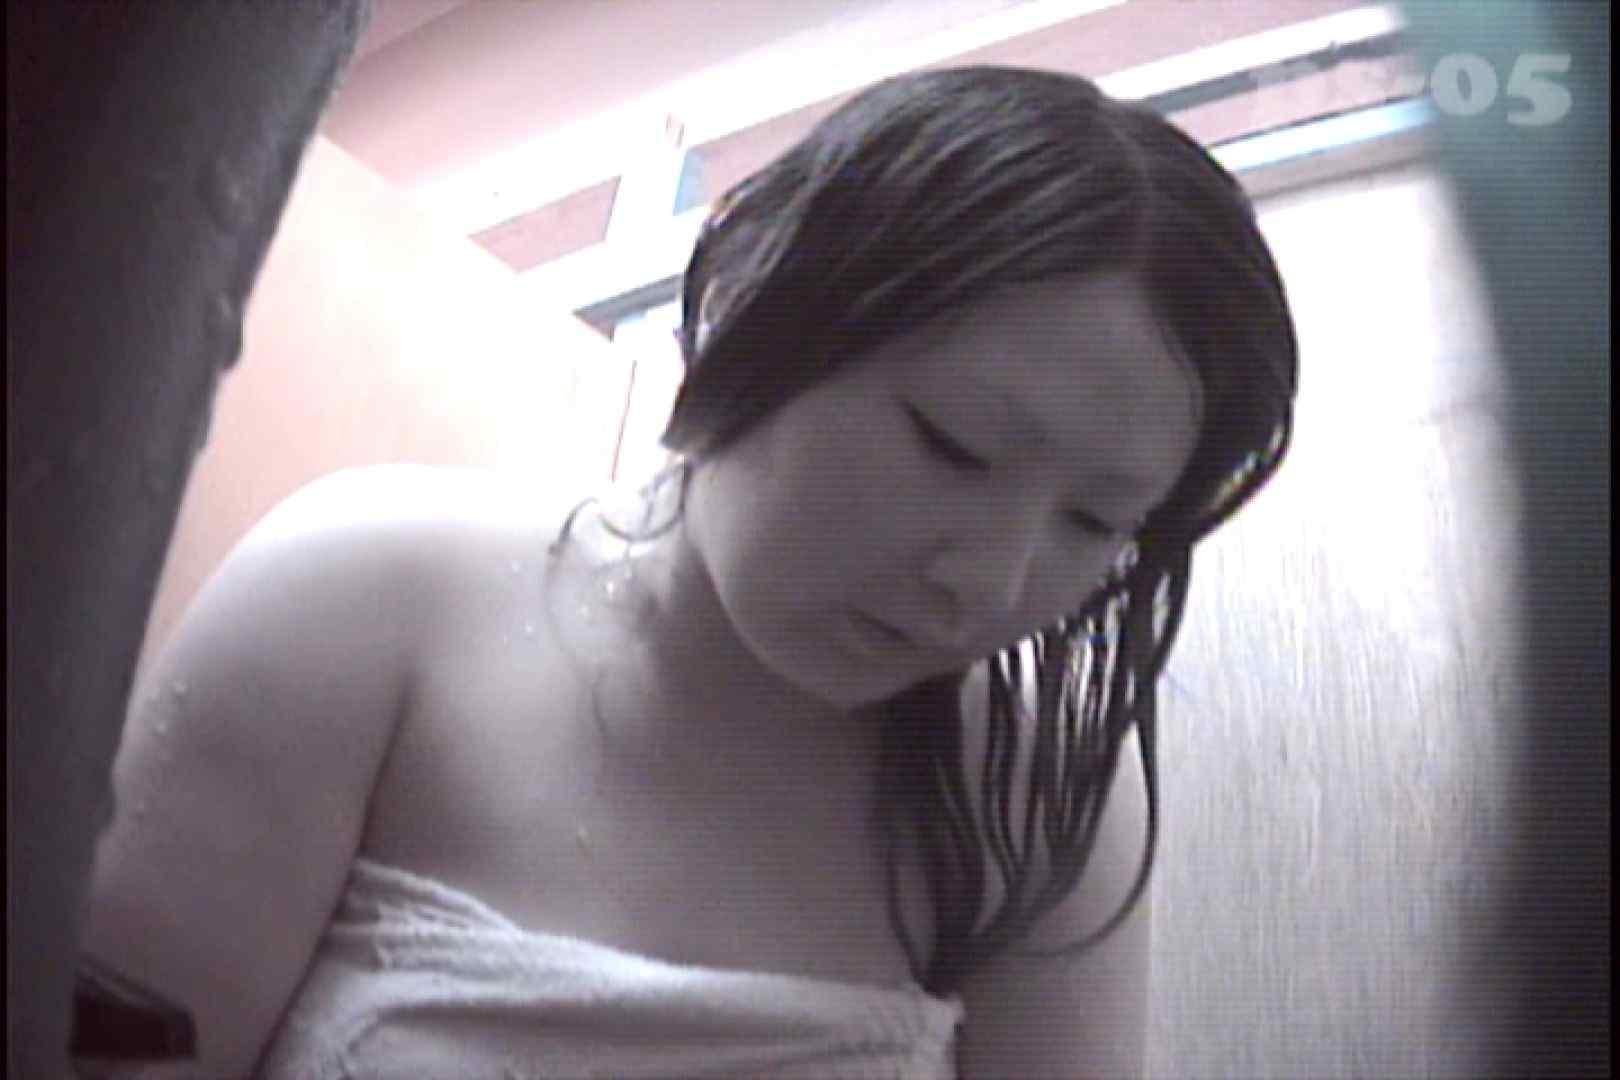 File.36 珍しいポチャポチャ嬢。なかなかの腹回りです。 シャワー AV動画キャプチャ 107画像 24